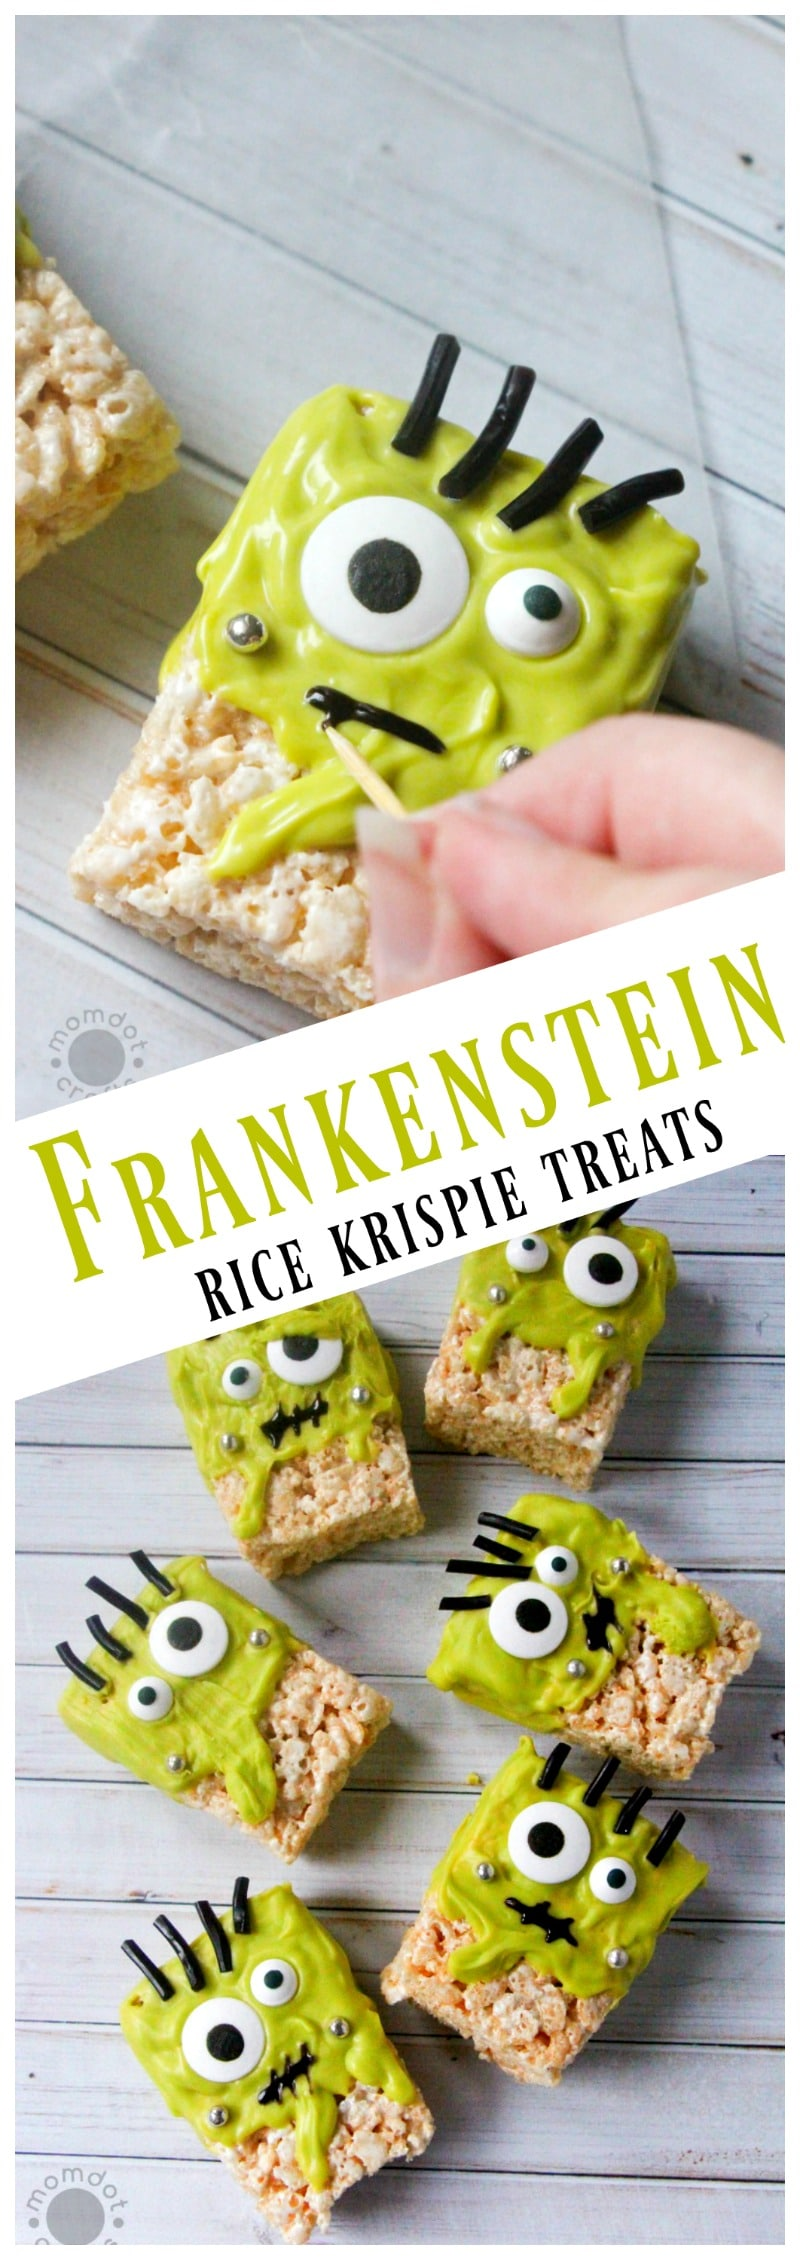 frankenstein rice krispie treat recipe a halloween holiday rice krispie monster recipe that is fun